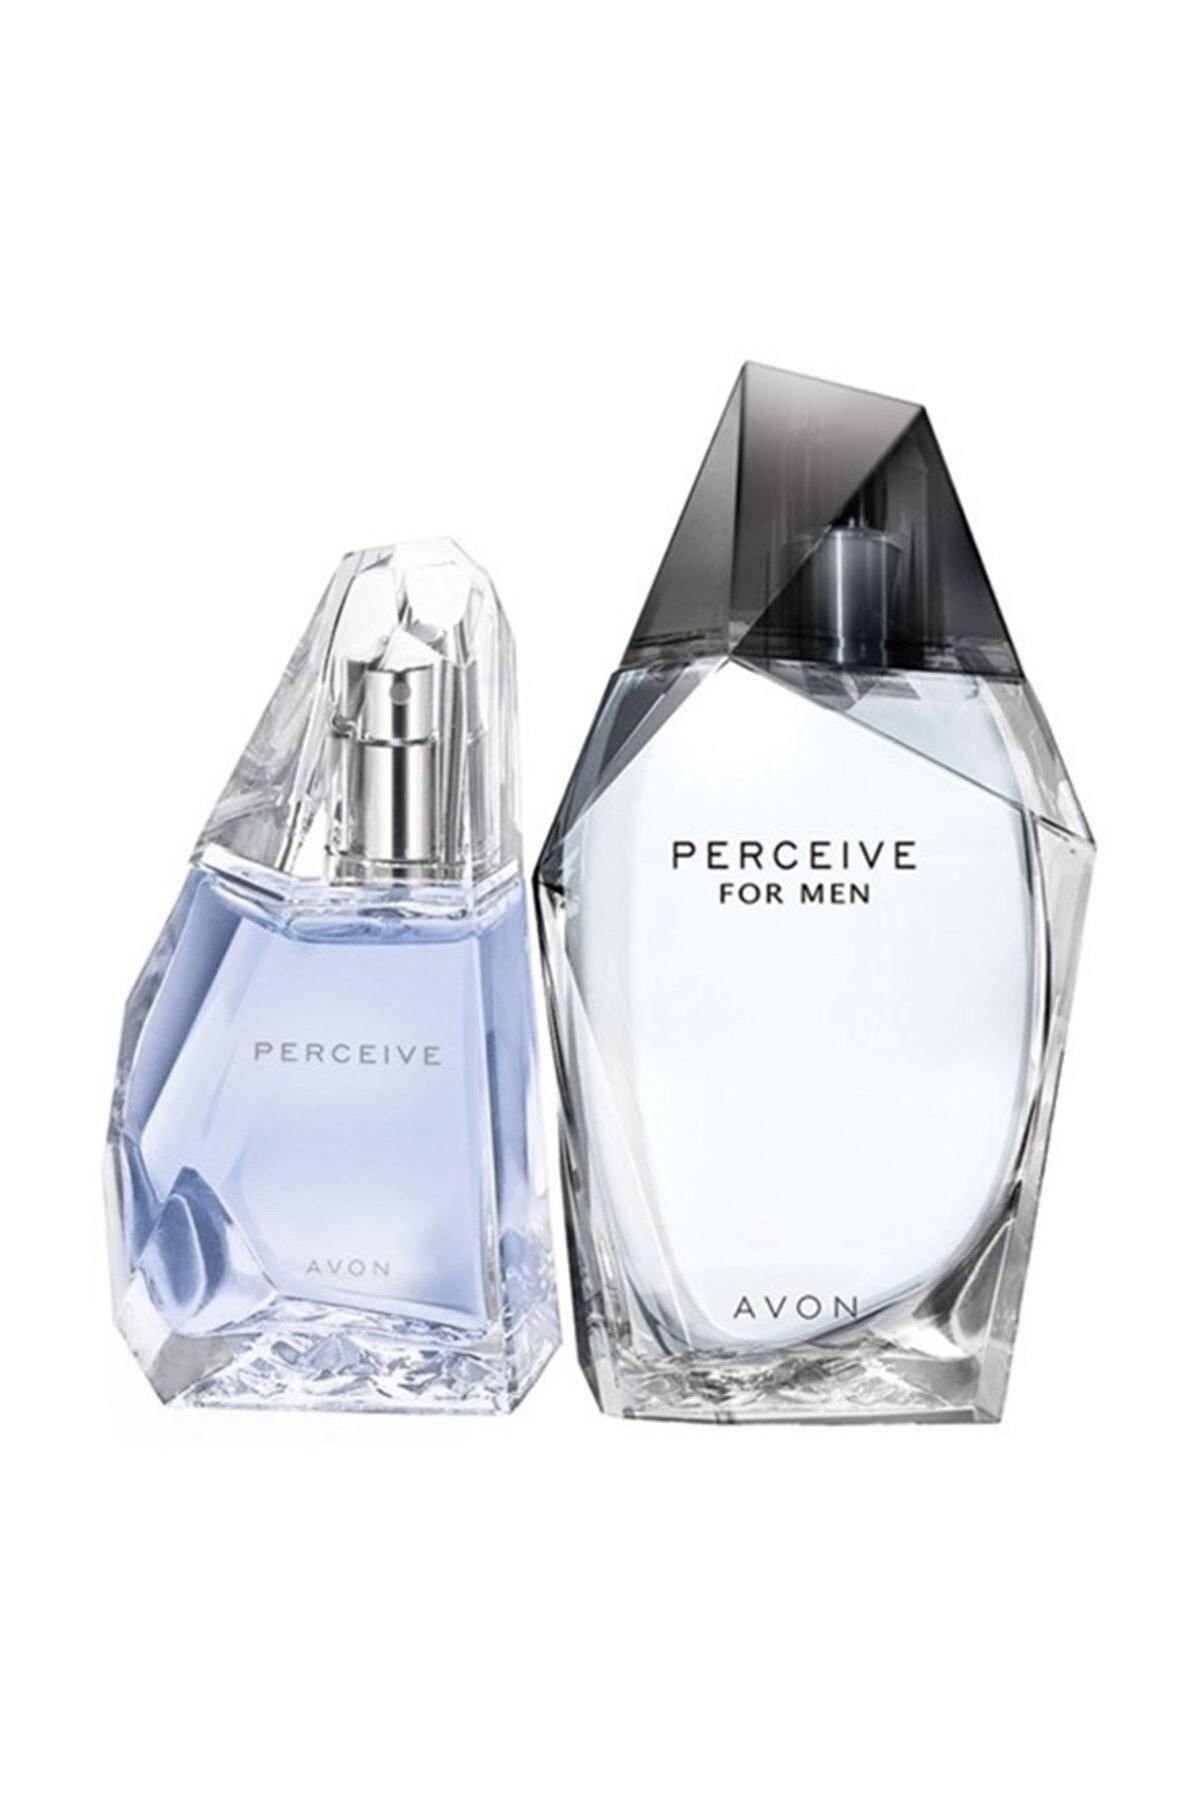 Avon Perceive Edp 50 ml Kadın Parfümü + Perceive Edt 100 ml Erkek Parfüm Seti 8681298981688